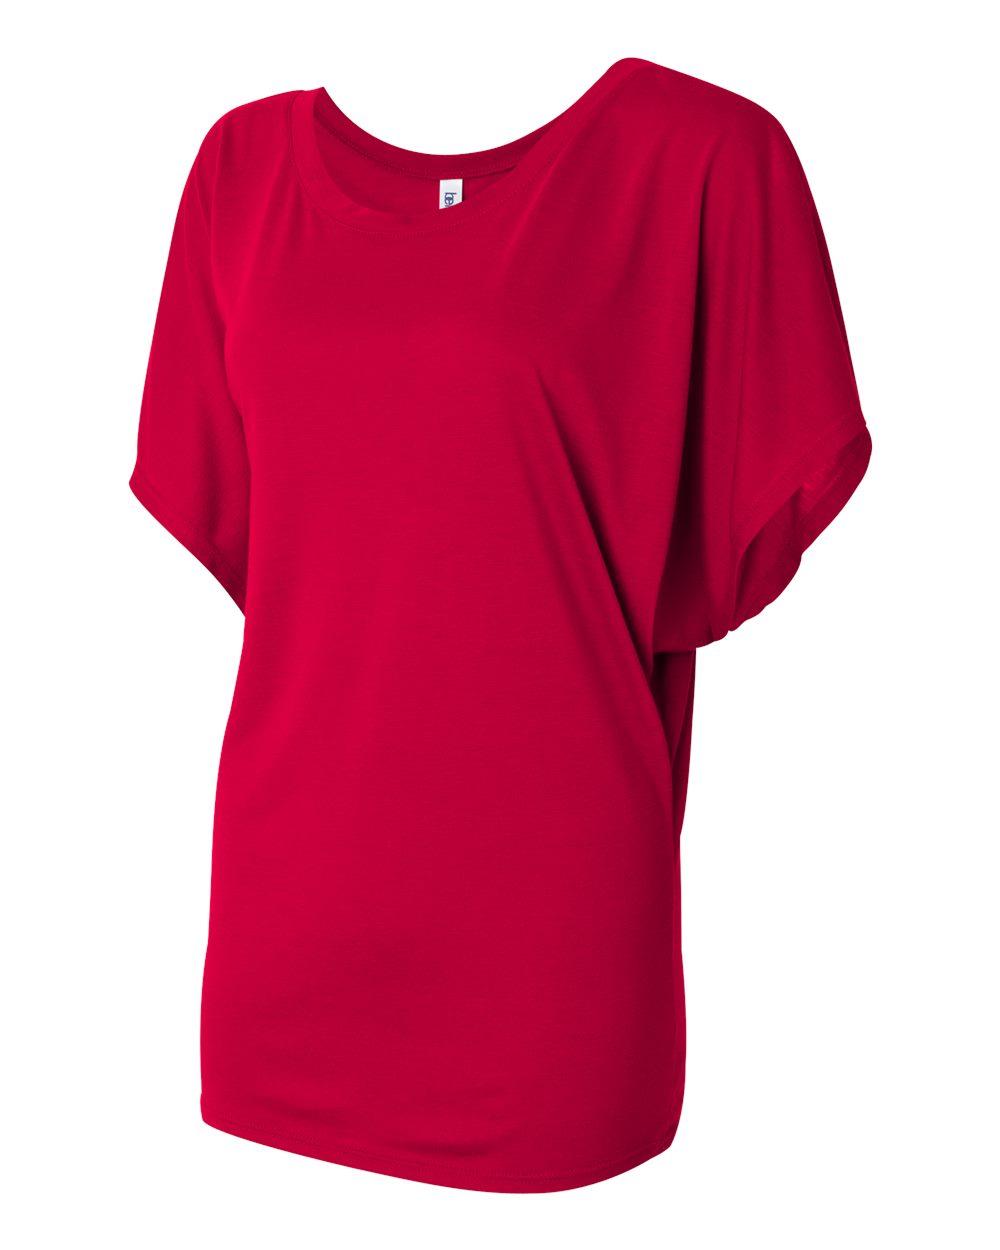 Bella-Canvas-Women-039-s-Flowy-Draped-Sleeve-Dolman-T-Shirt-8821-S-2XL thumbnail 33